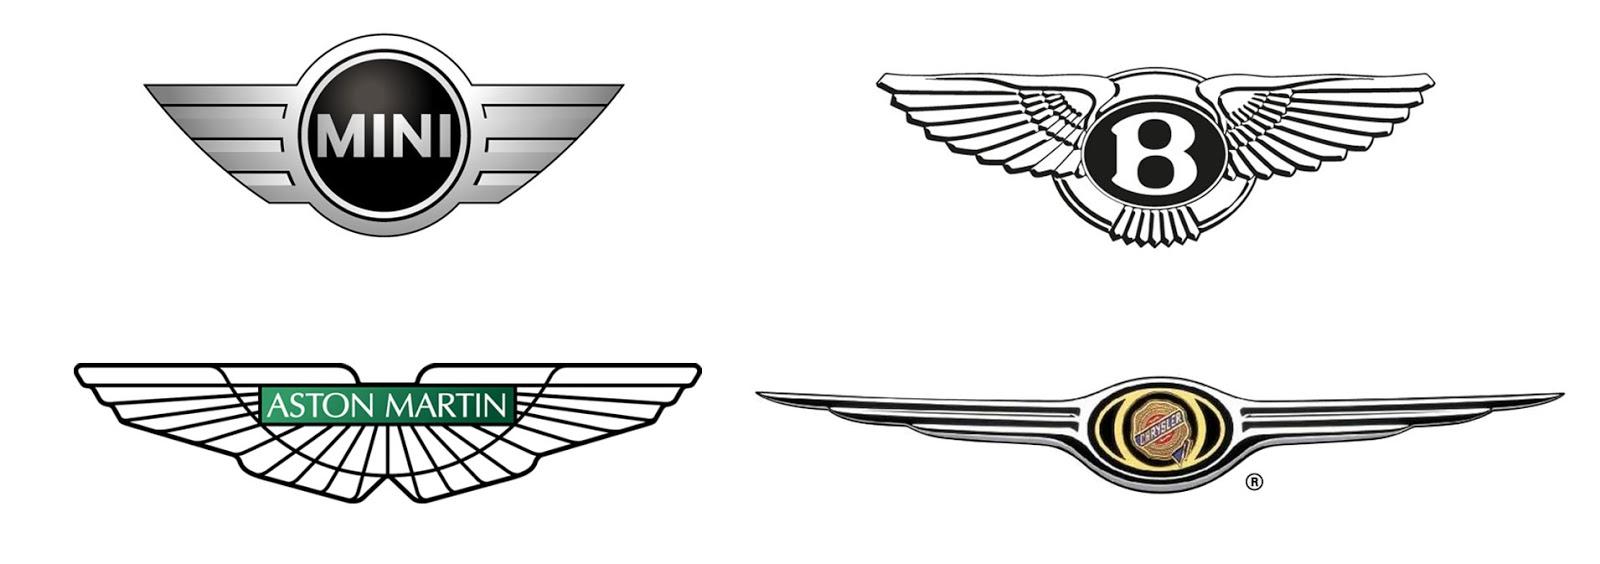 Car Logos Luxury Luxury Car Logos With Wings